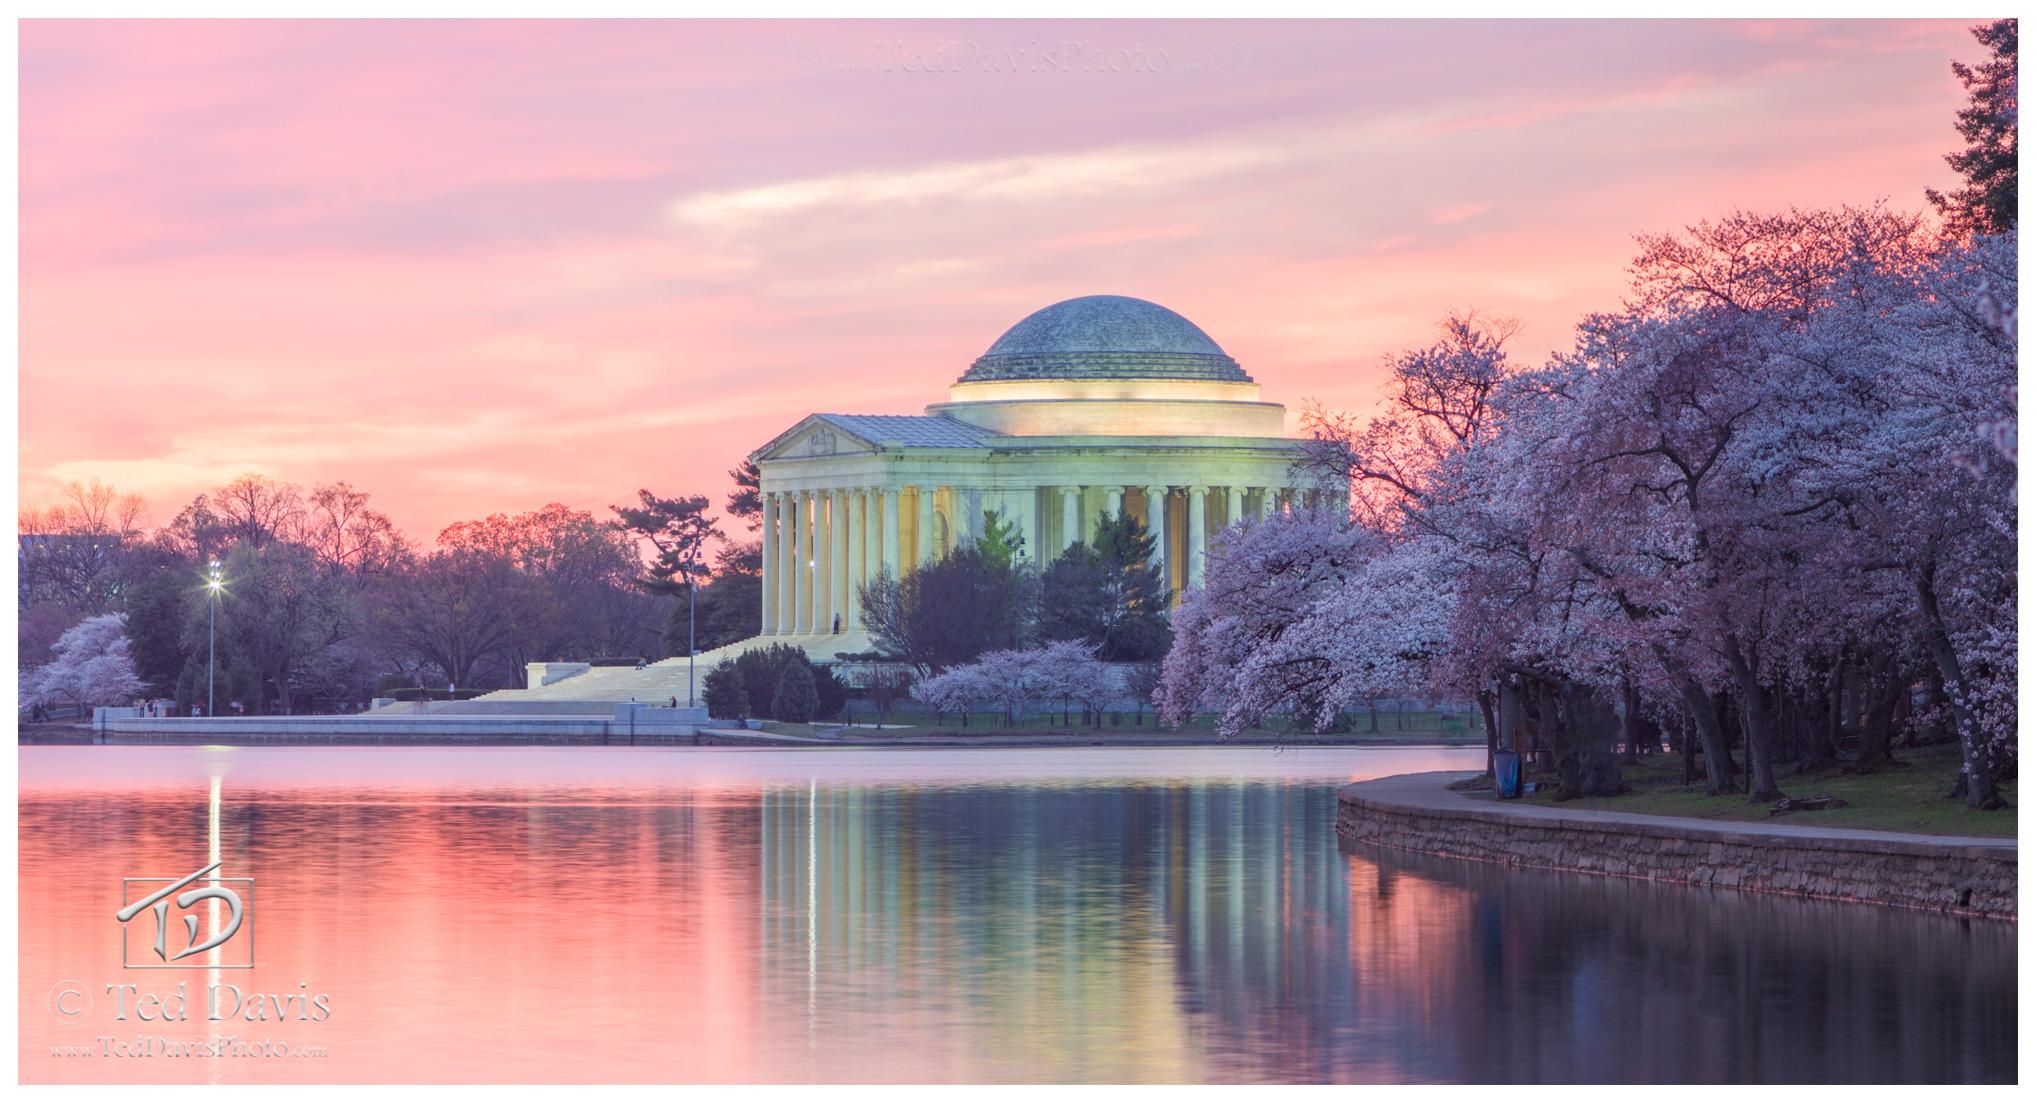 Tidal, Basin, Washington, DC, Jefferson, Memorial, Cherry, Blossoms, marvelous, pink, whites, pastels, photo